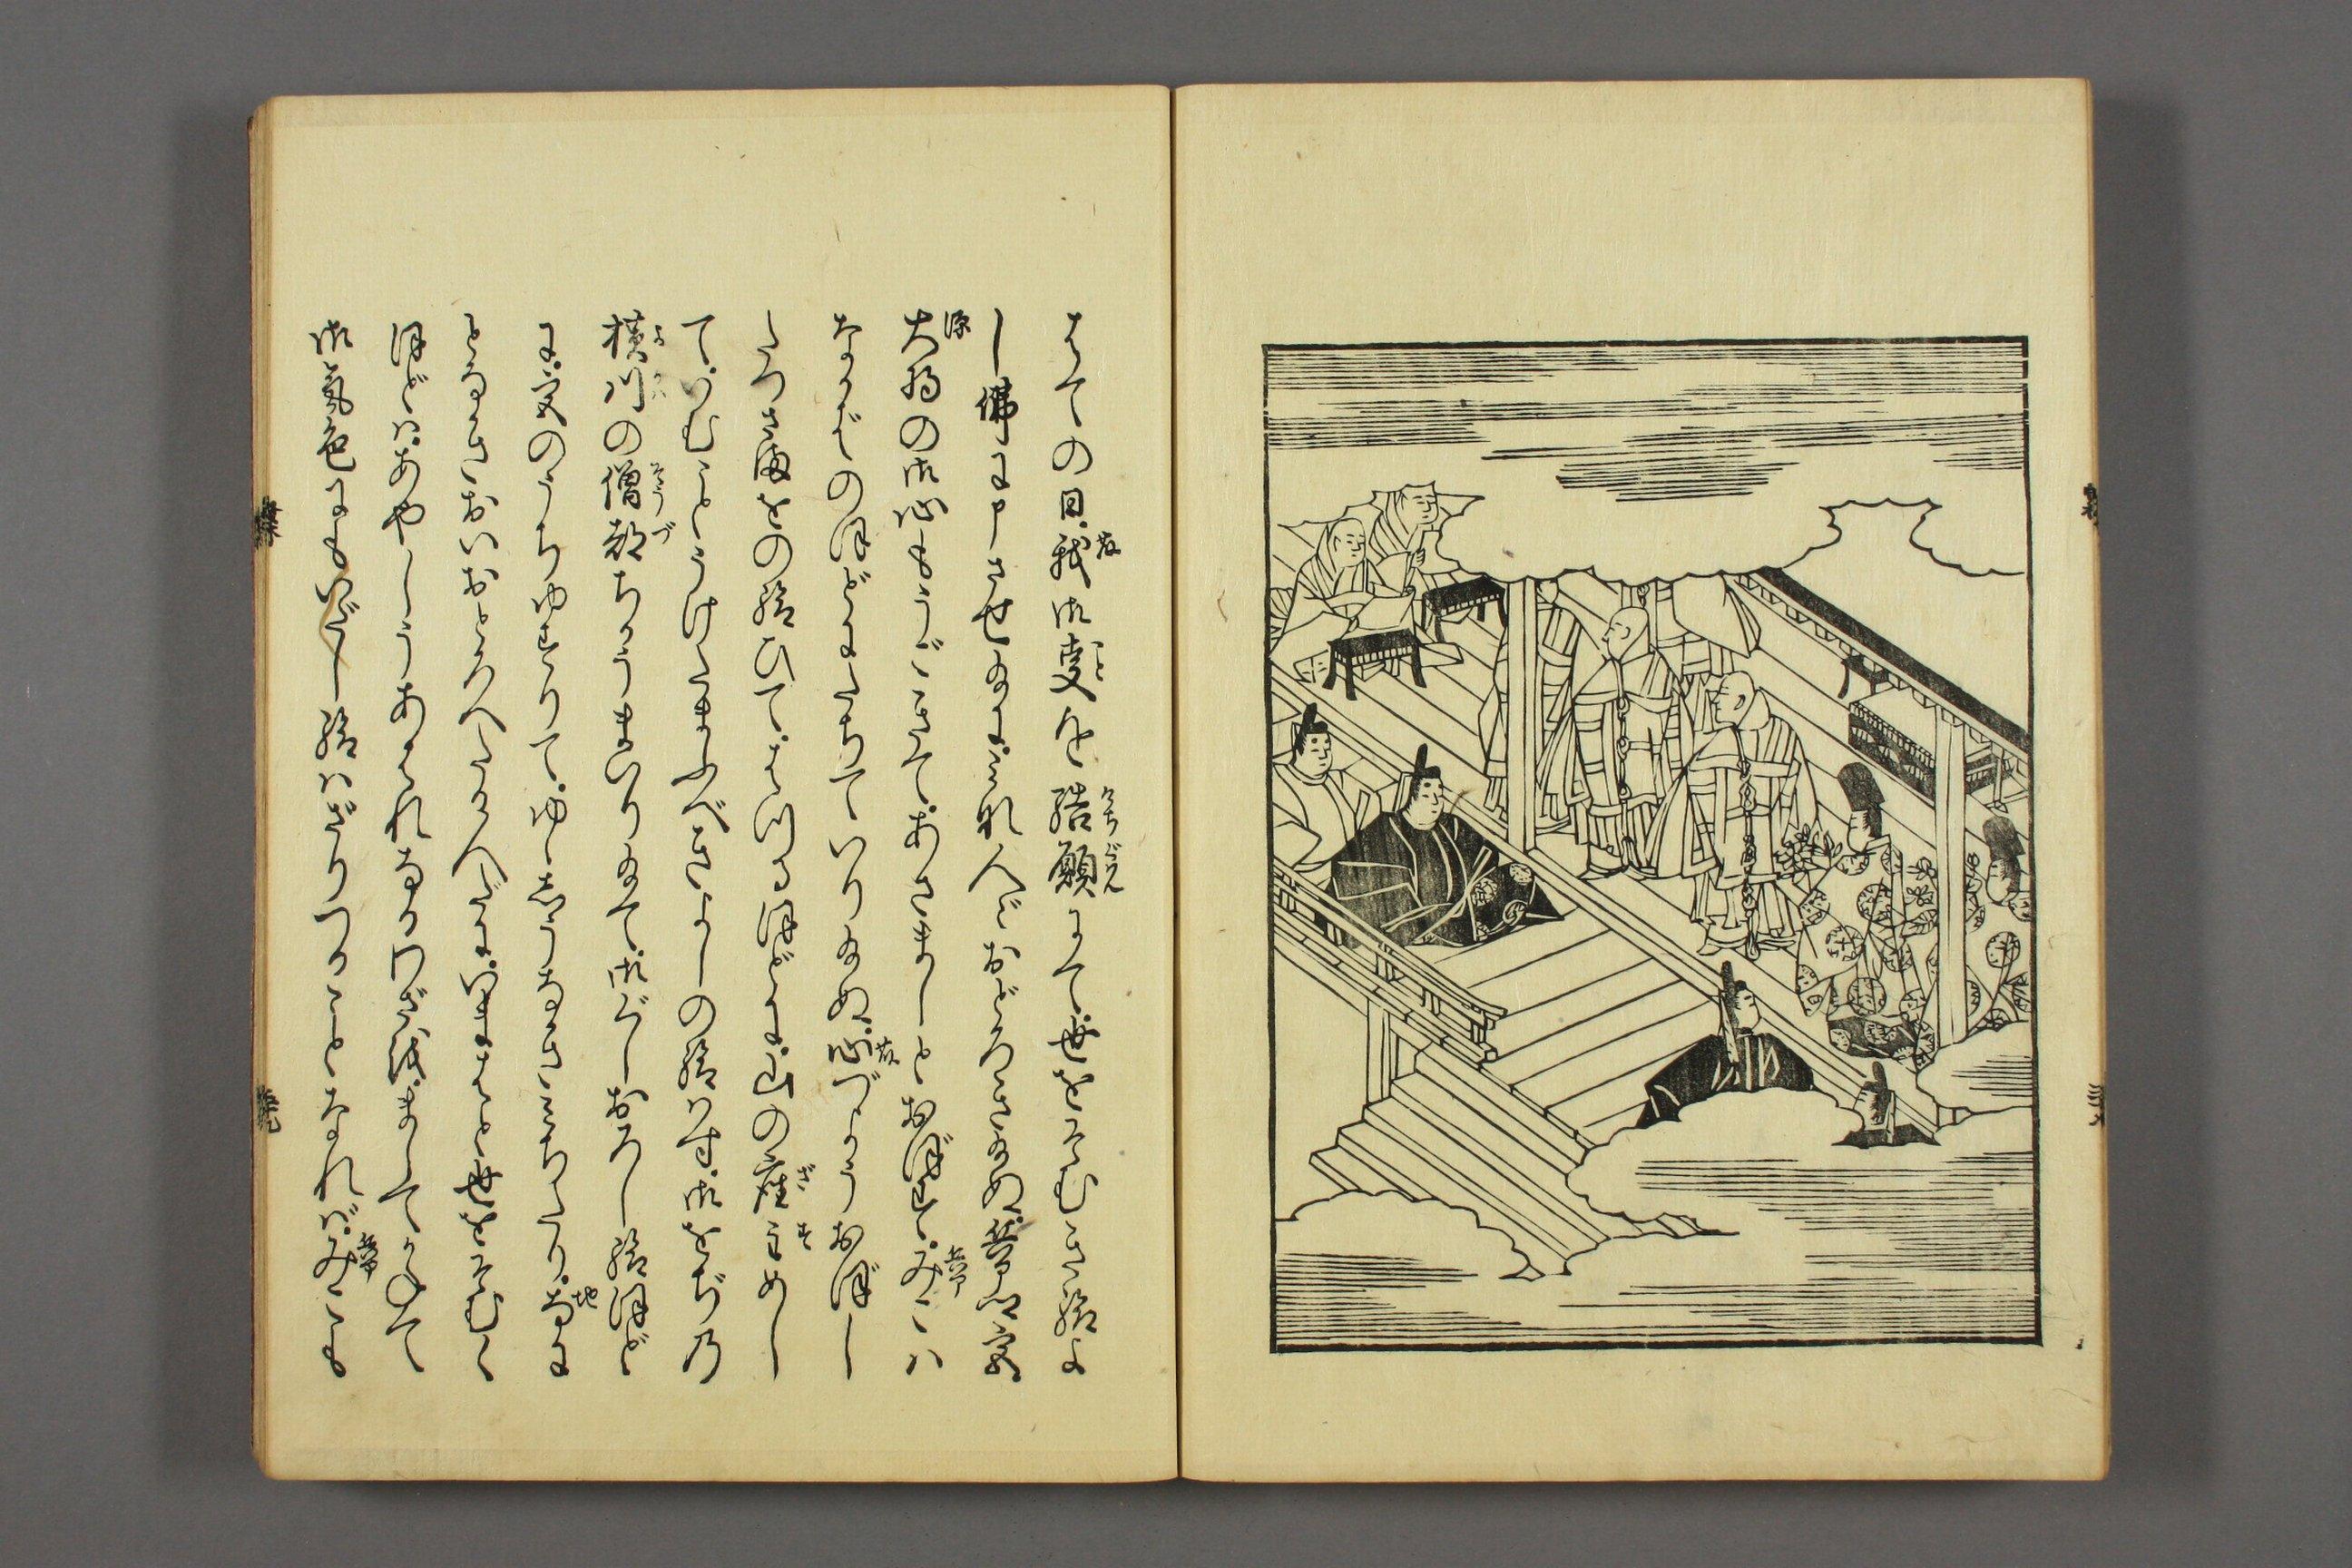 http://archive.wul.waseda.ac.jp/kosho/bunko30/bunko30_a0007/bunko30_a0007_0010/bunko30_a0007_0010_p0040.jpg